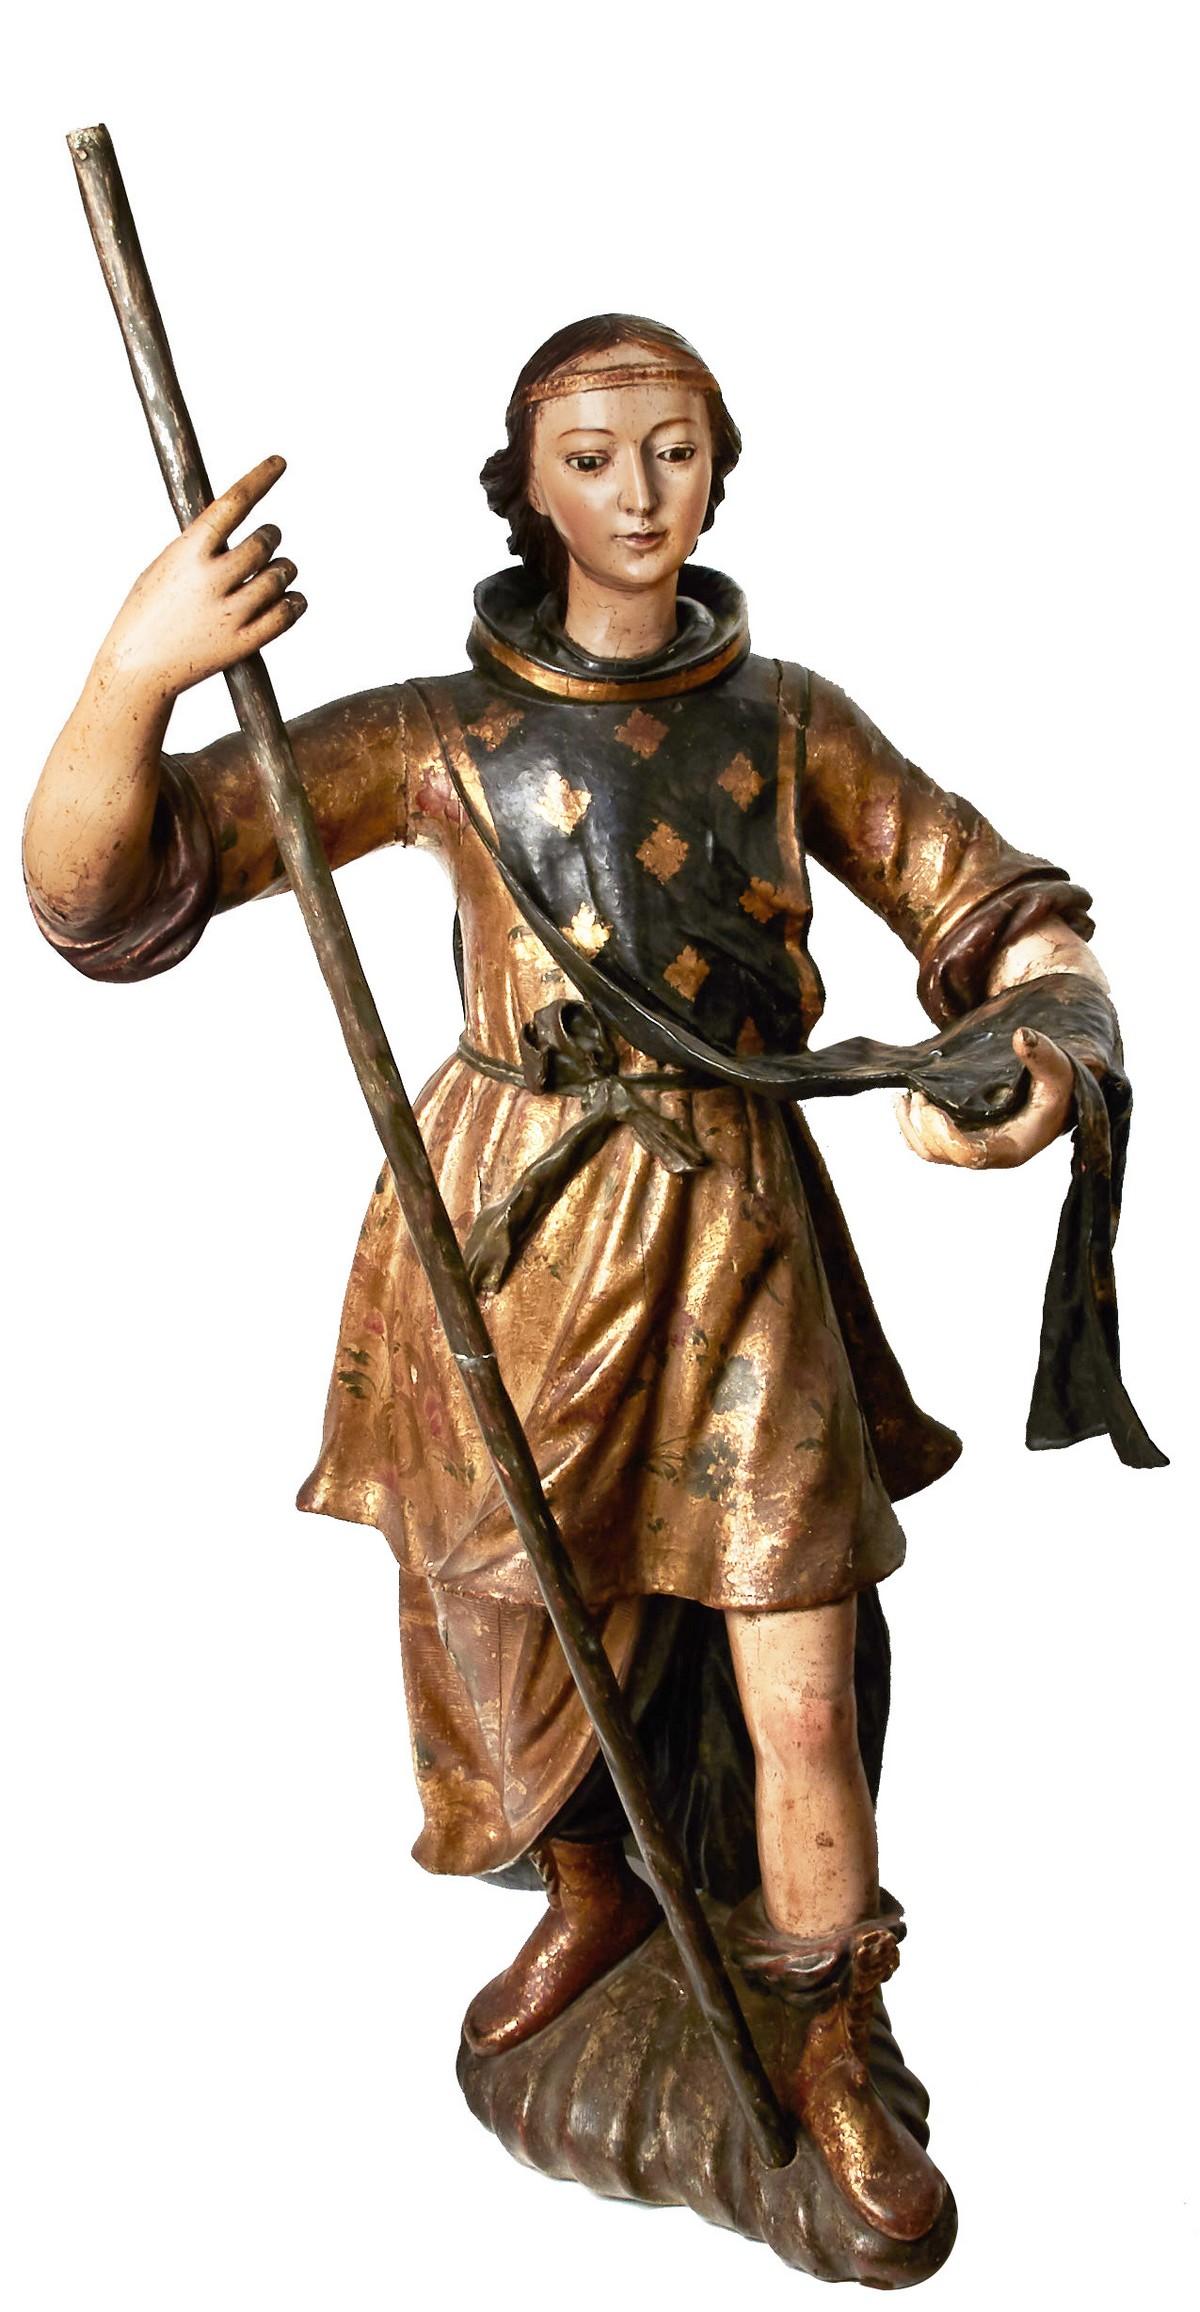 ESCUELA ANDALUZA. Arcángel San Rafael. Escultura en madera tallada, policromada y dorada (s. XVII)